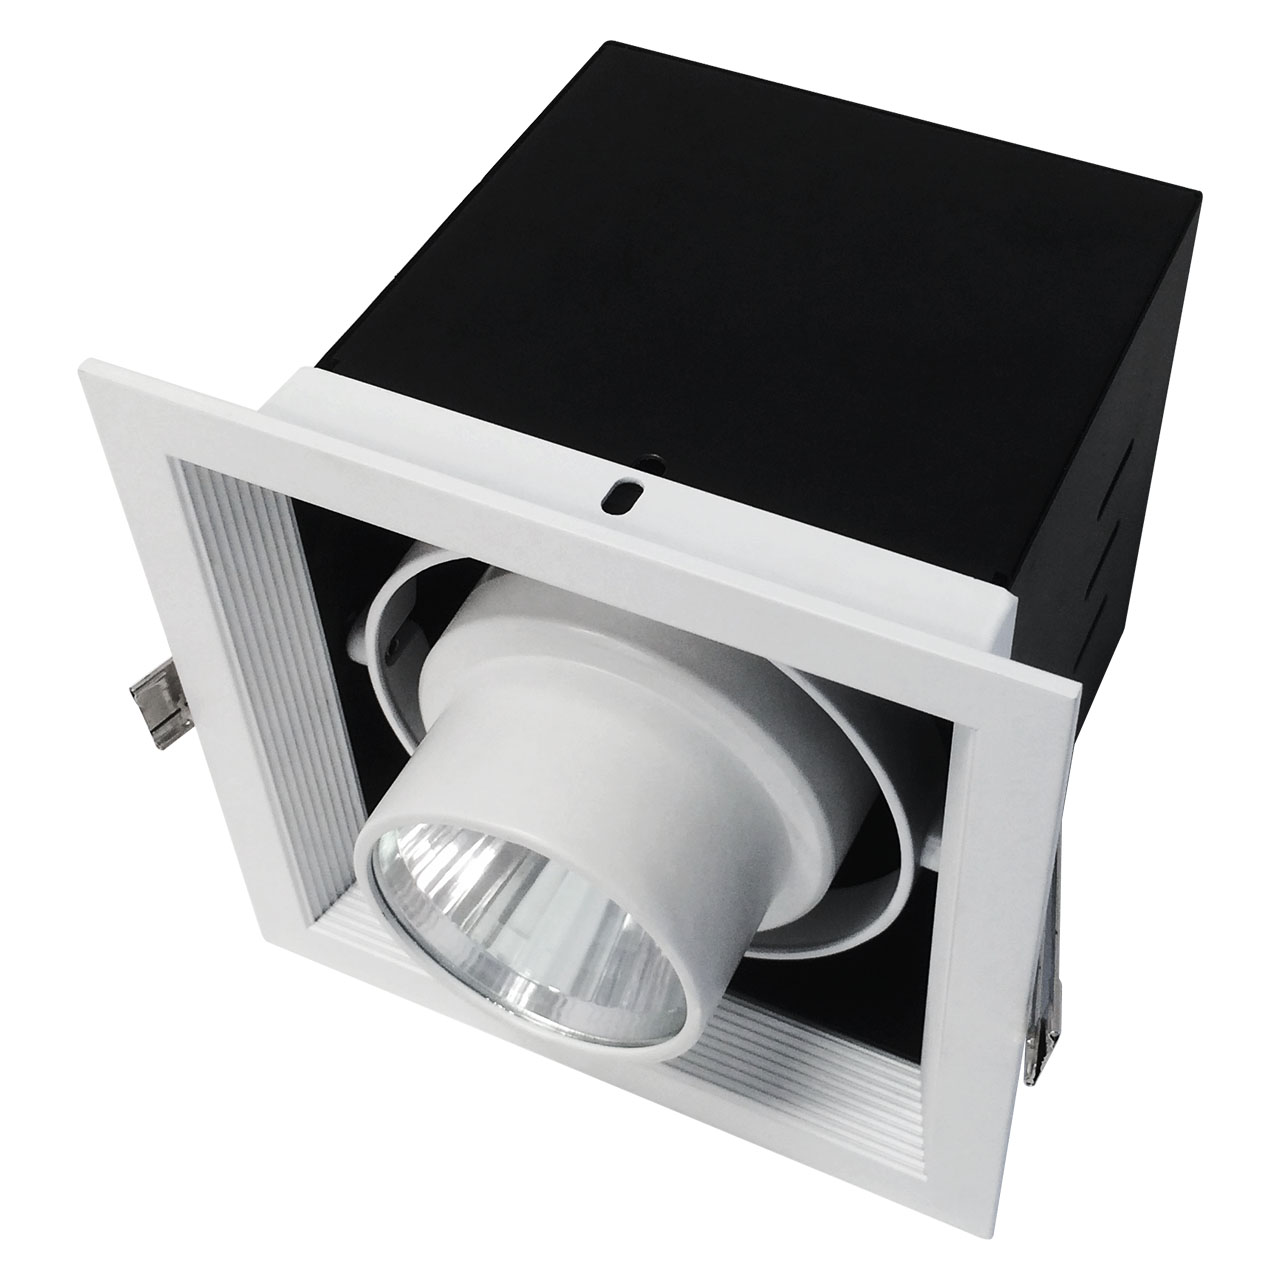 LED Cabinet Light, LED Ceiling Light, Recessed Light, NEBULA_SRT031, Oasistek